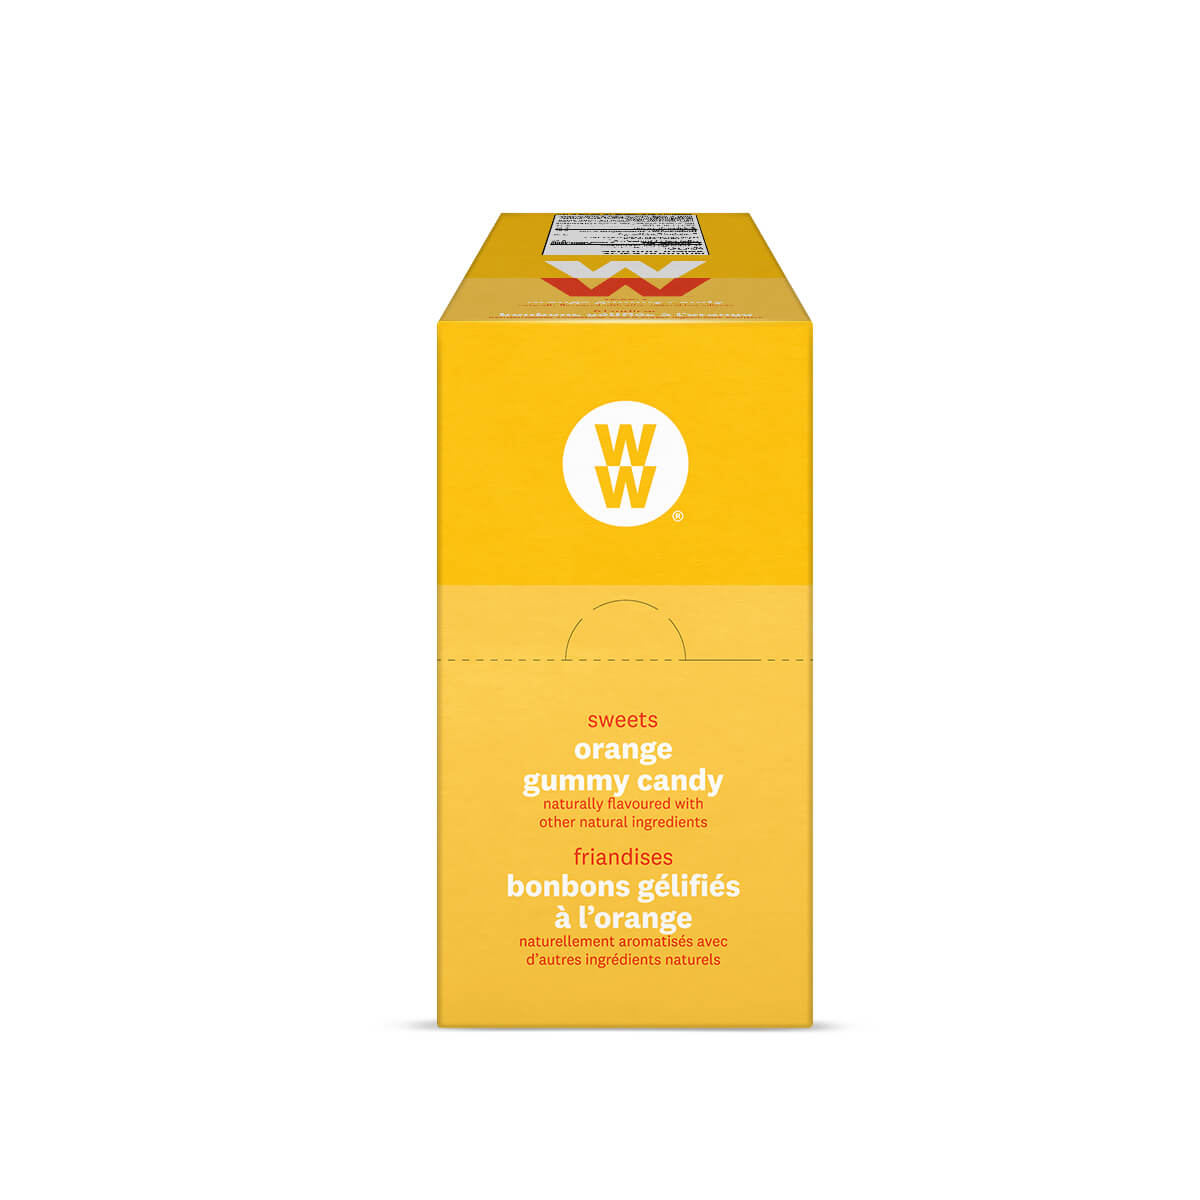 WW Sweets Orange (Box of 12)  - side of the box